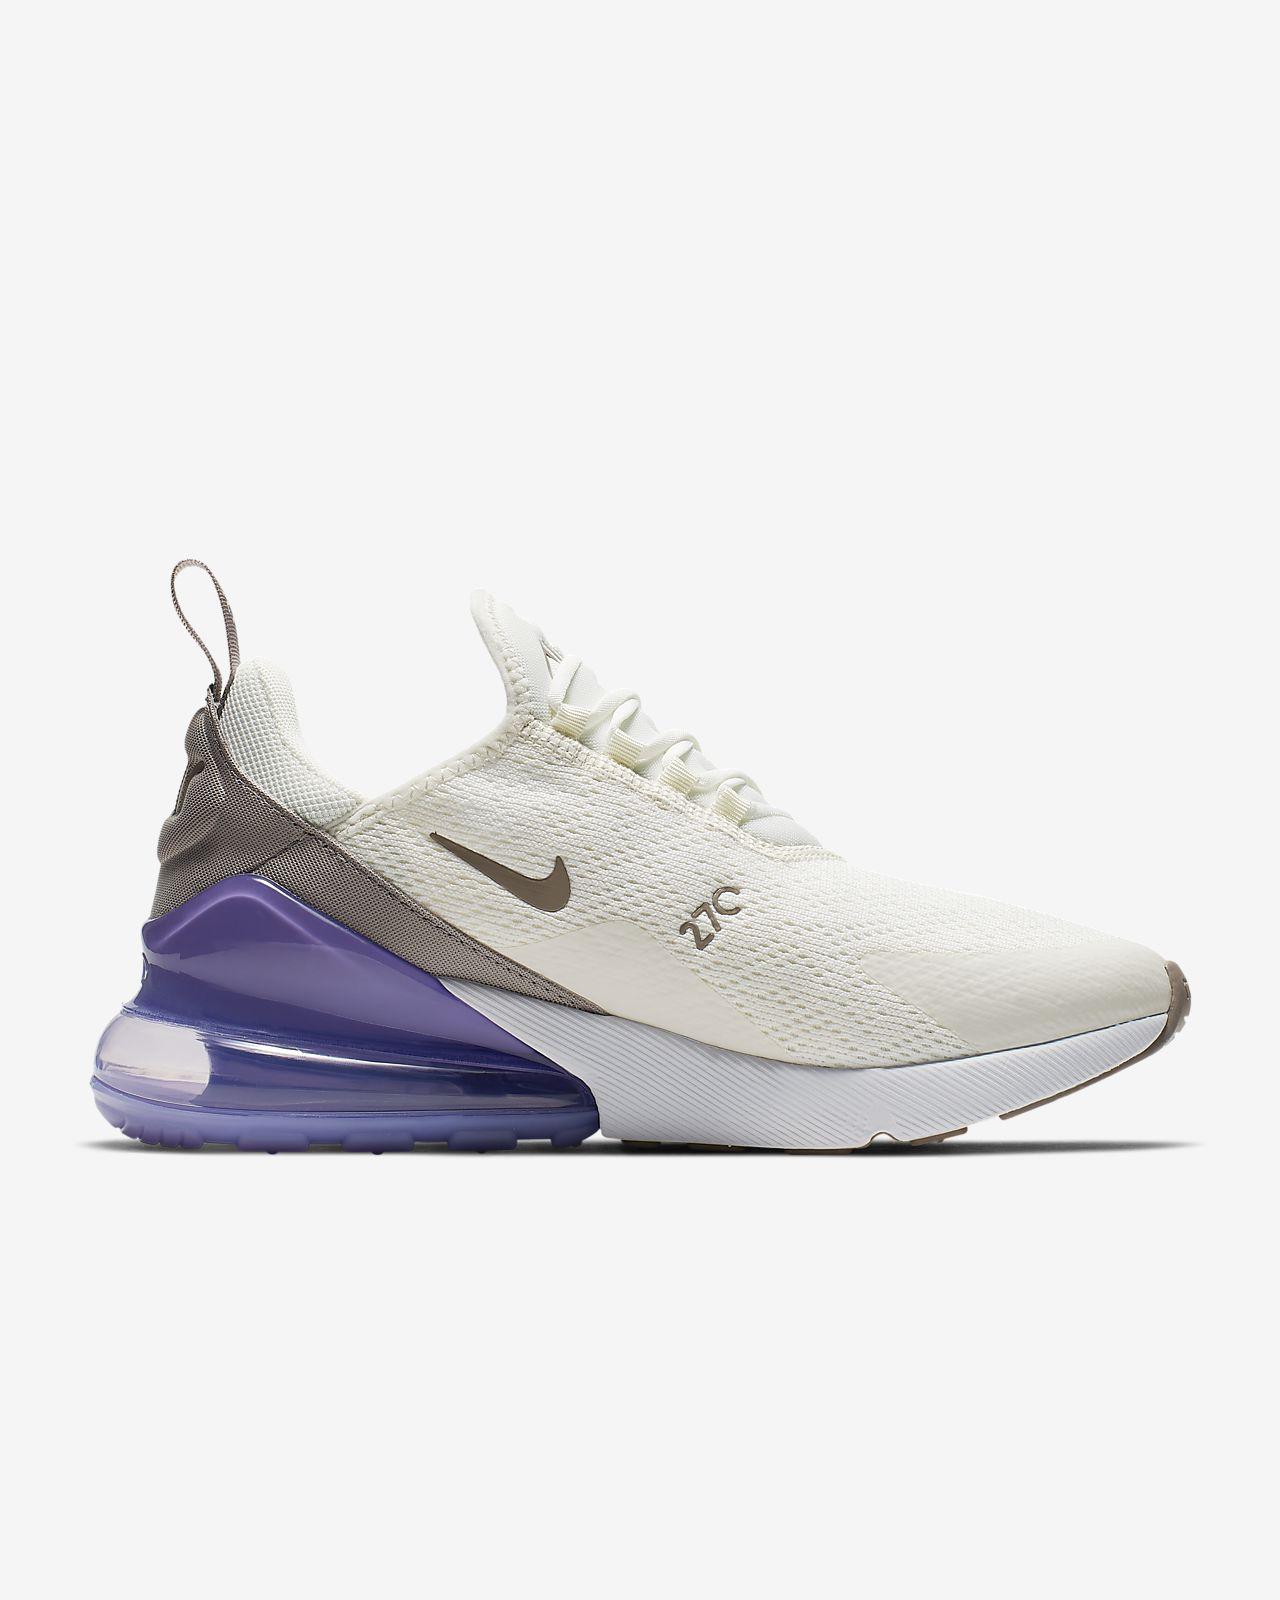 innovative design 58d53 abf5e ... Chaussure Nike Air Max 270 pour Femme